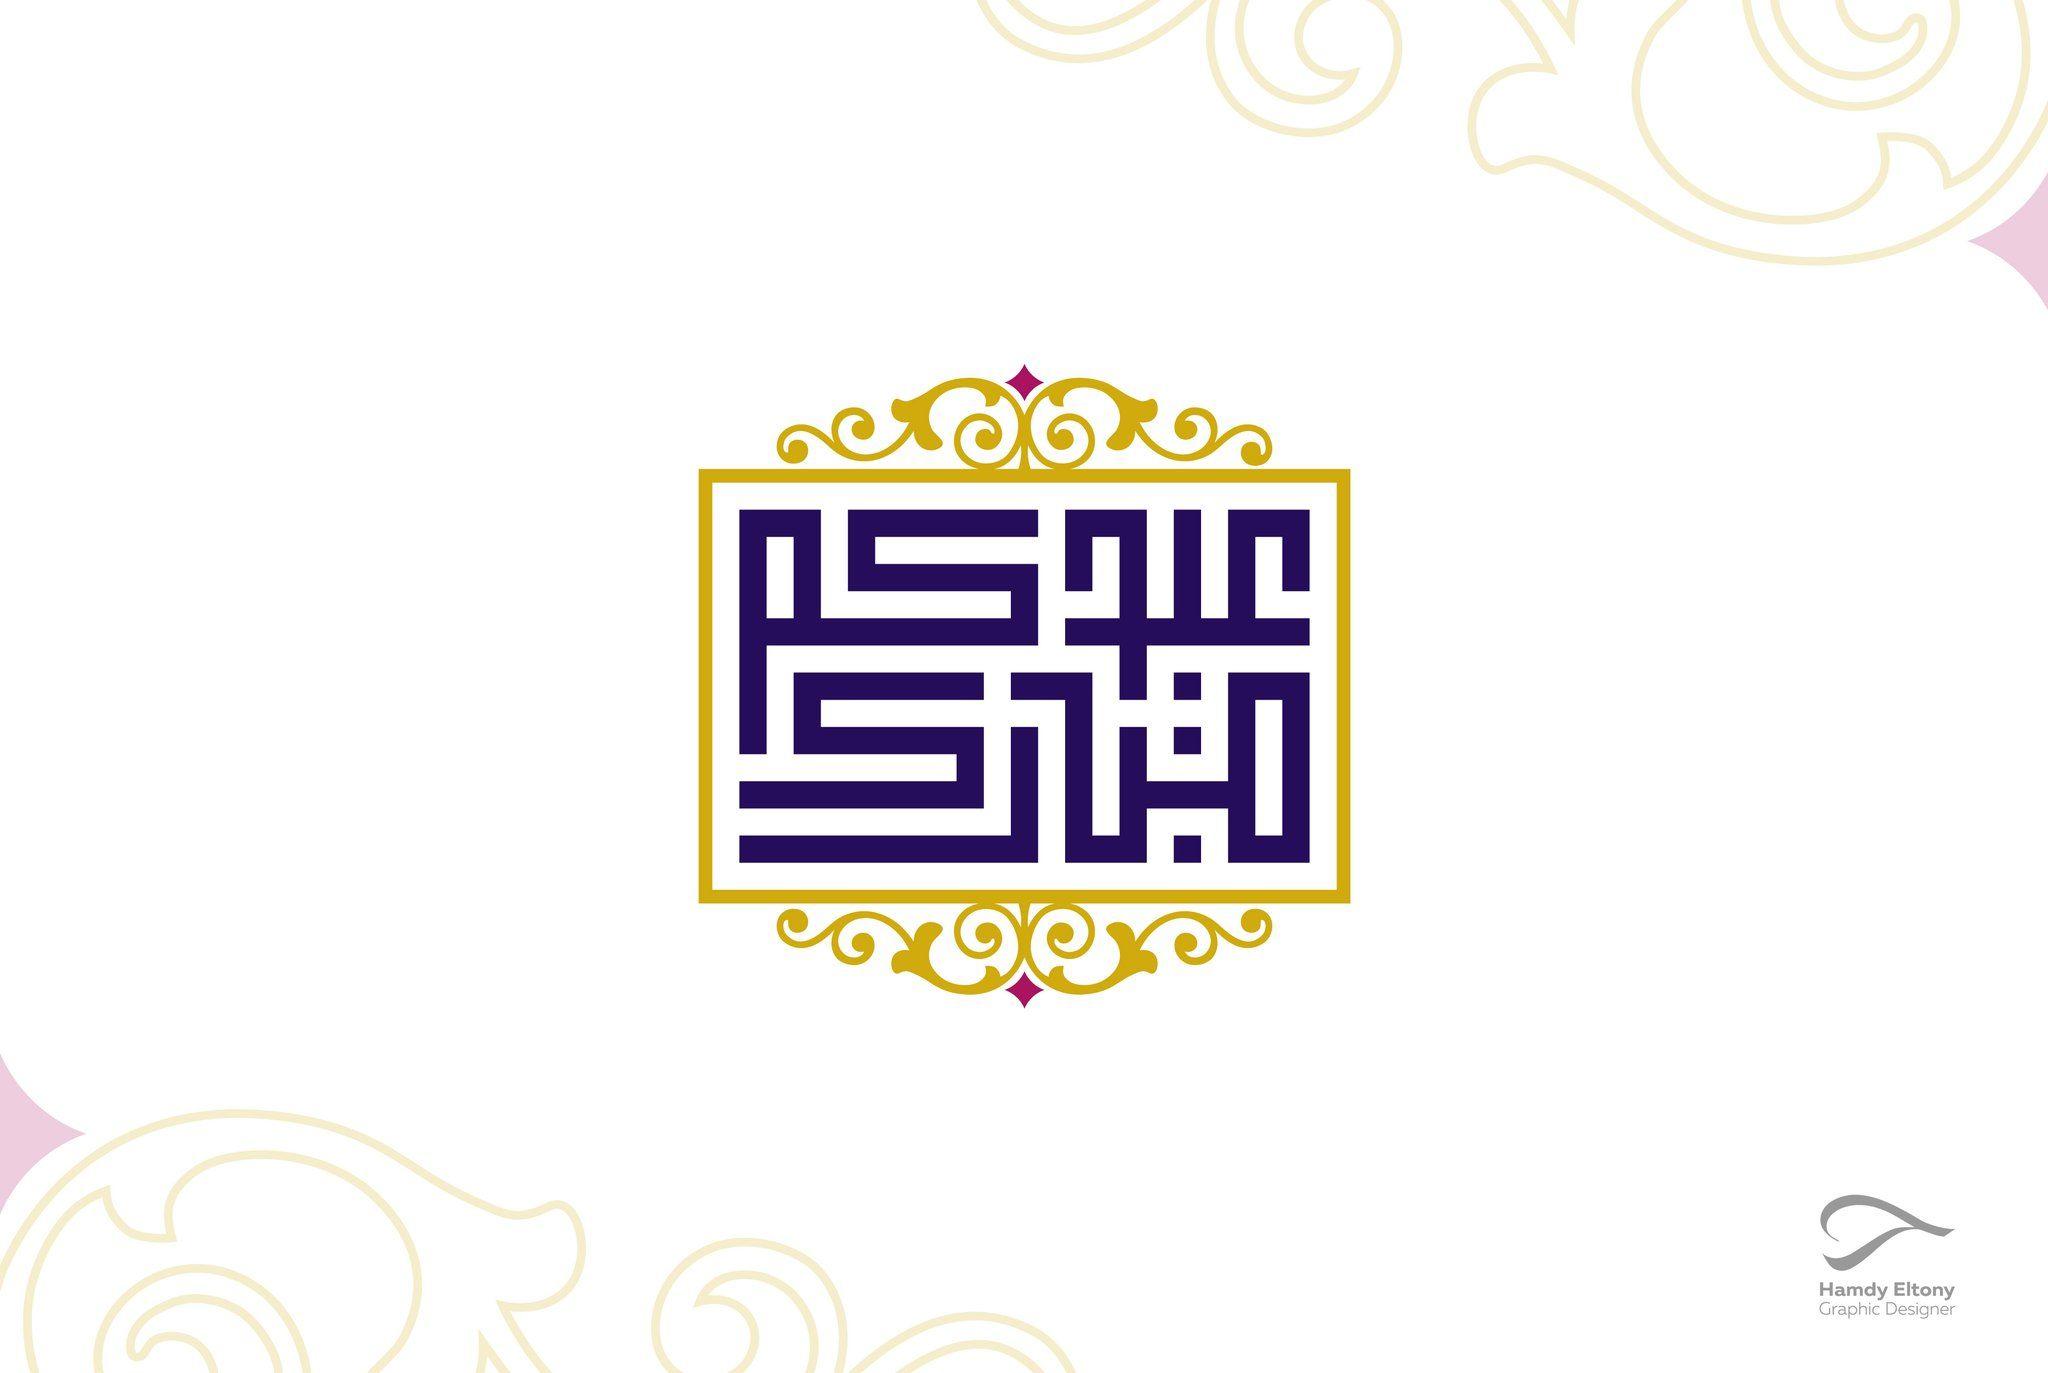 Hamdy Eltony On Twitter Islamic Art Calligraphy Arabic Calligraphy Art Islamic Art